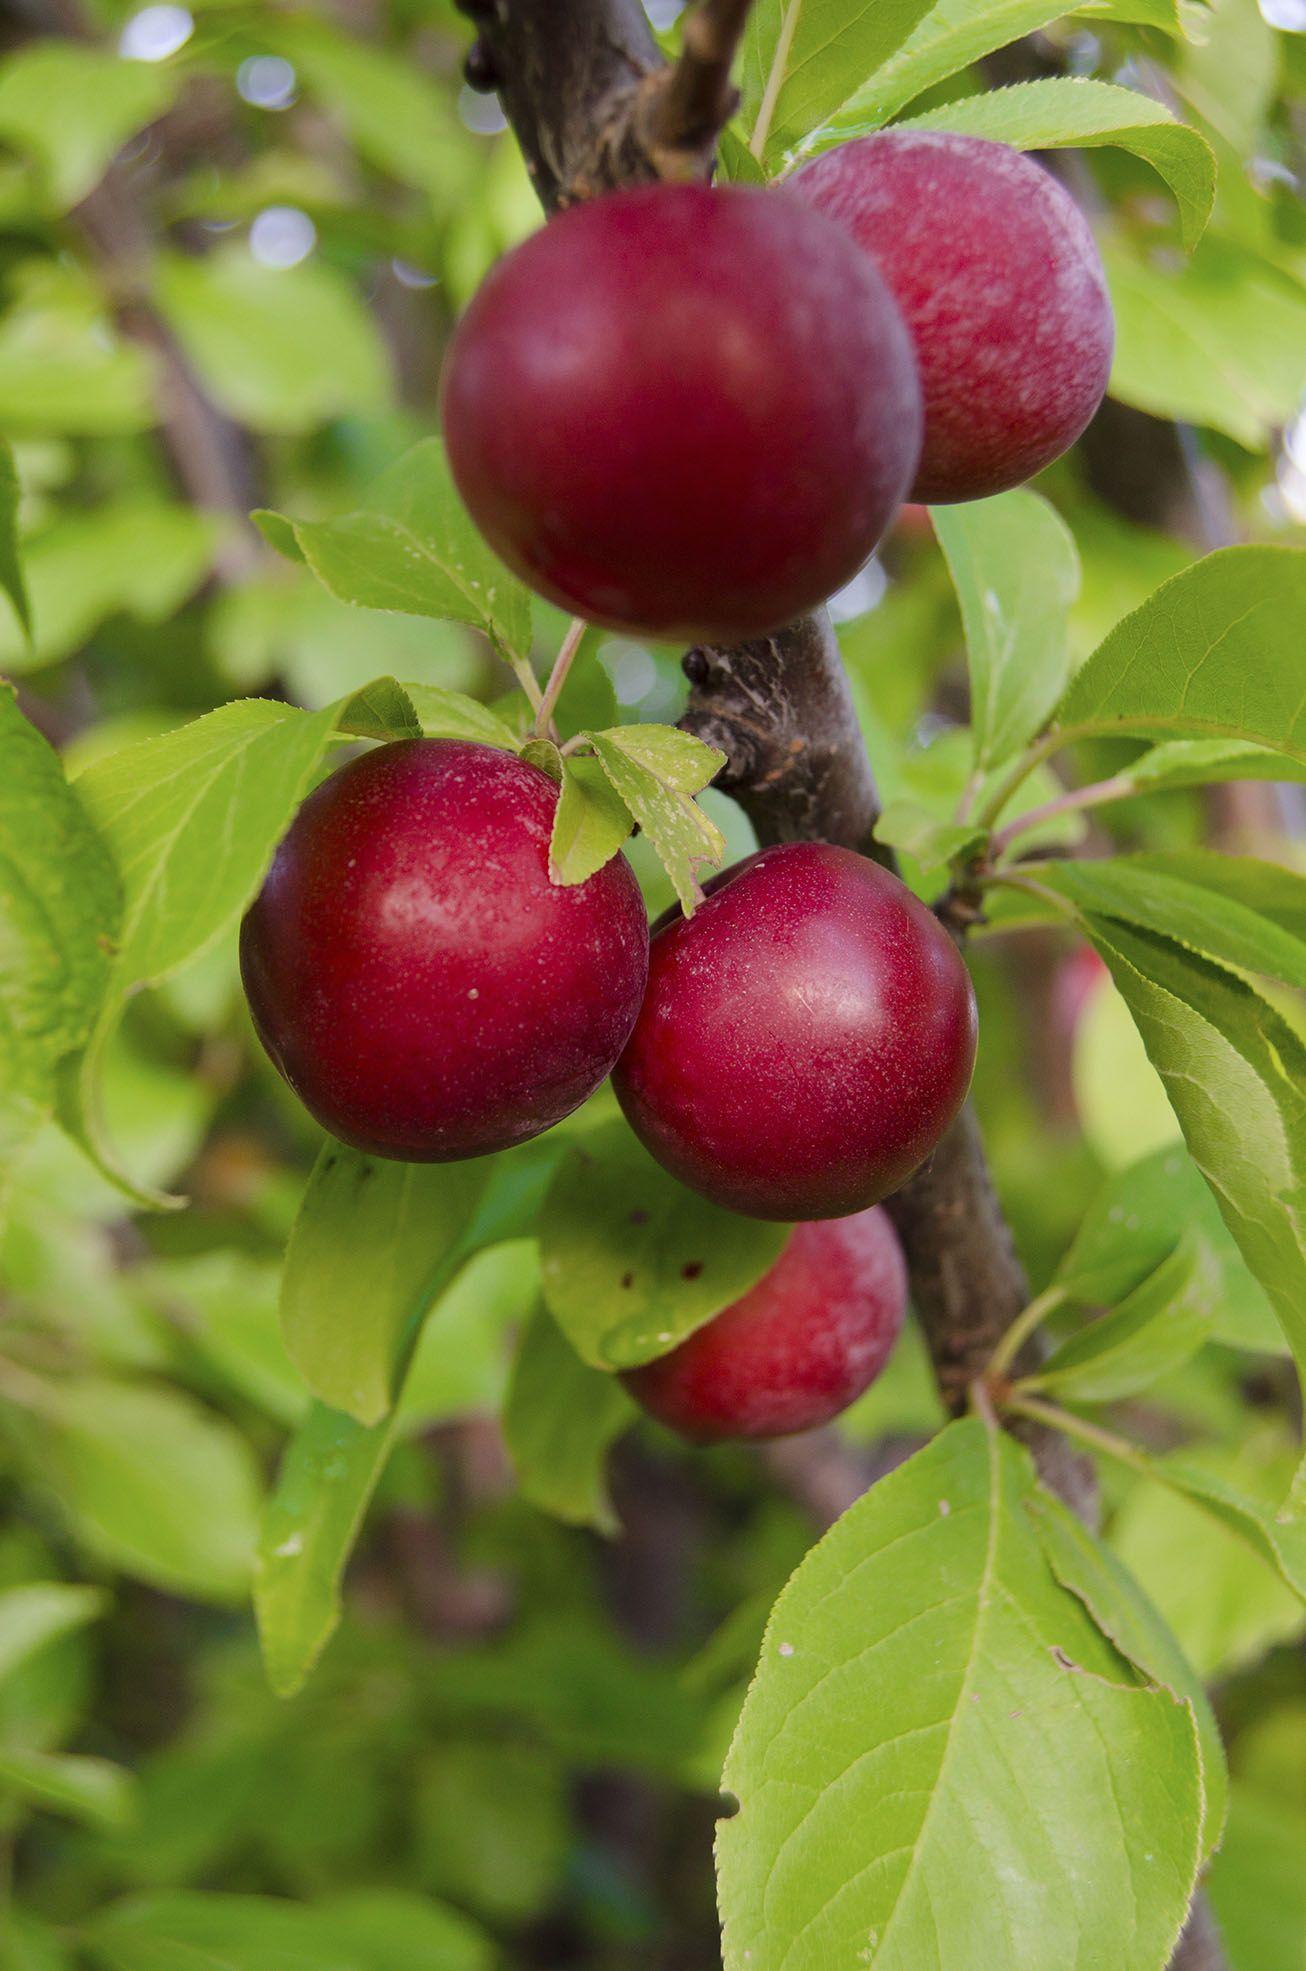 Santa rosa plum tree at backyard fruit fruit trees for Fruit trees